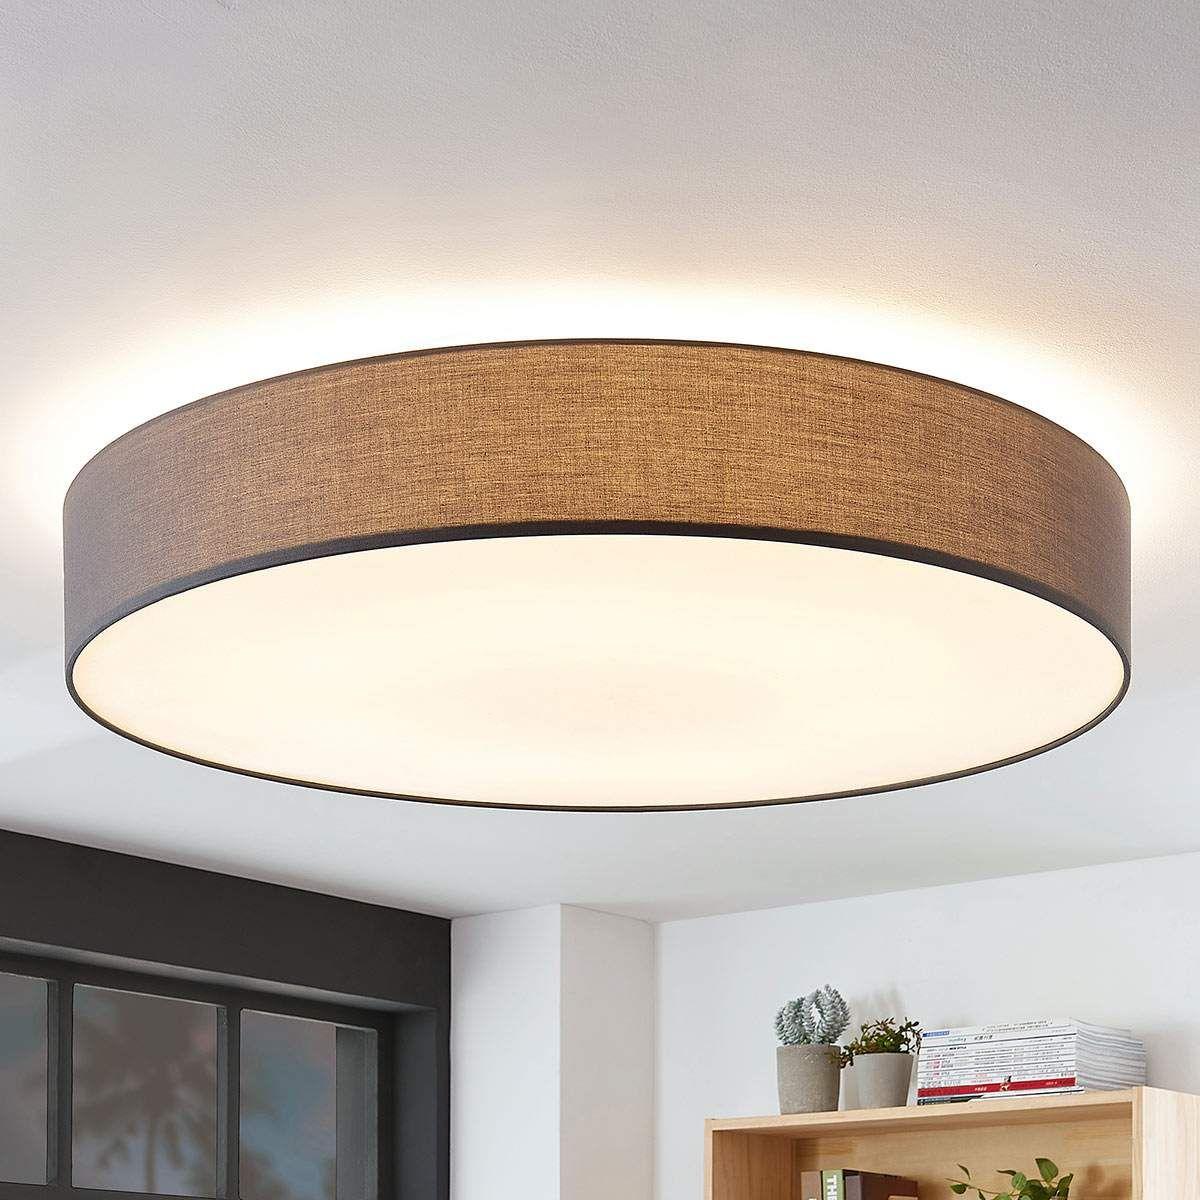 Stoff-Deckenlampe Gordana in Grau in 9  Deckenlampe, Lampe